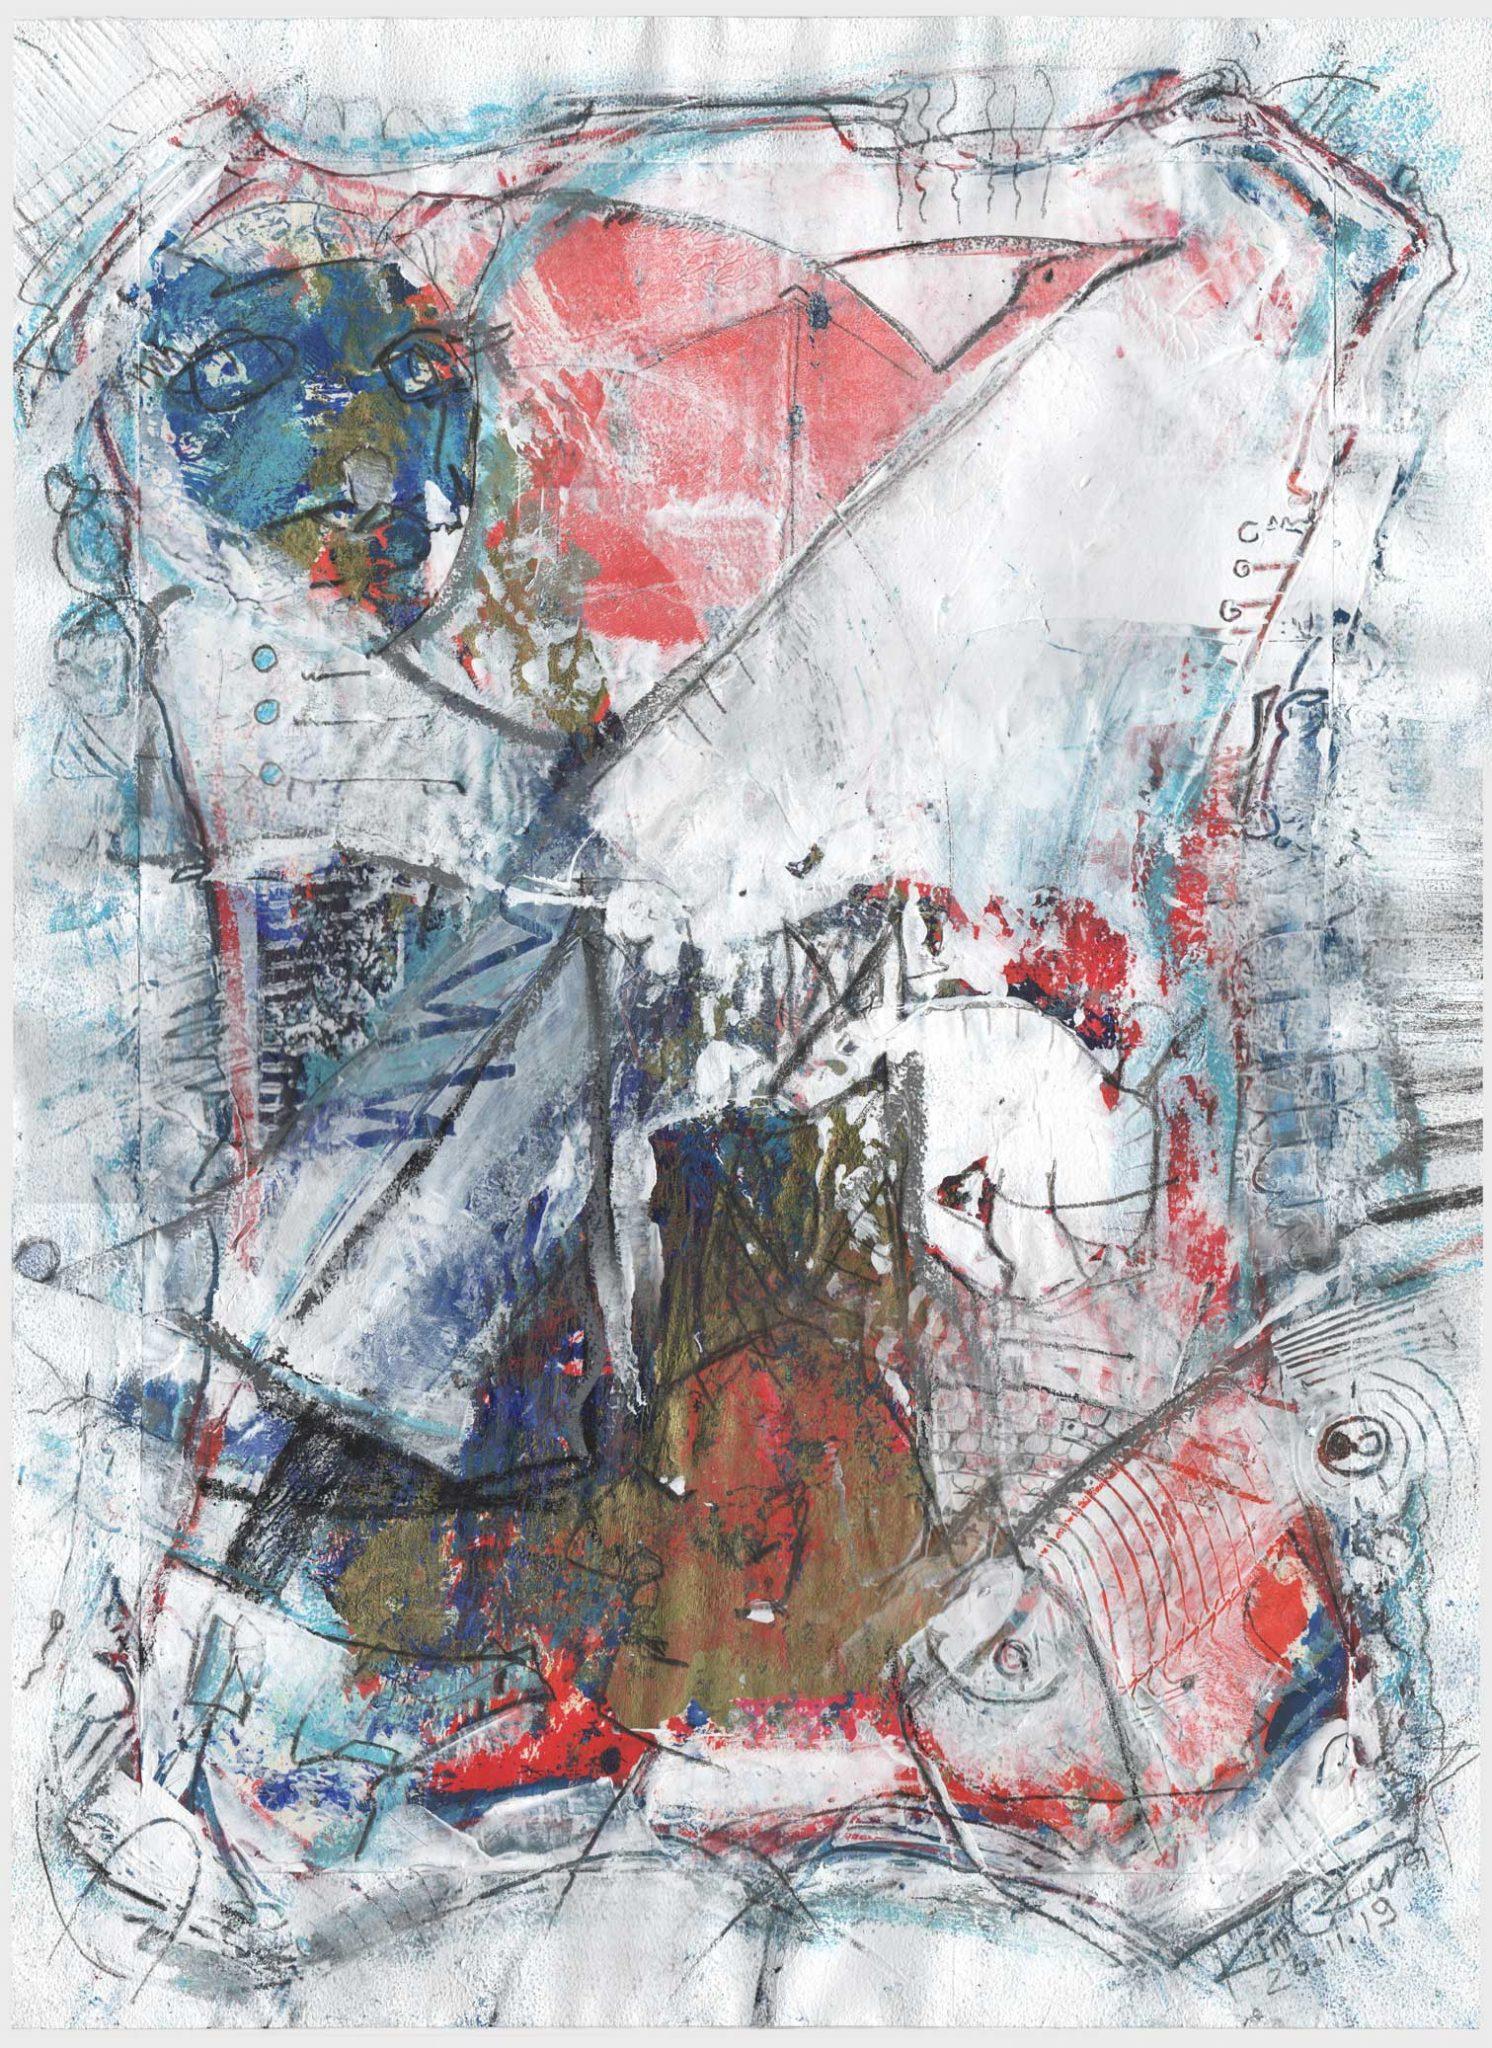 Kim Okura - Joytrophy guinea pig - versuchskaninchen 100 prozent bio painting